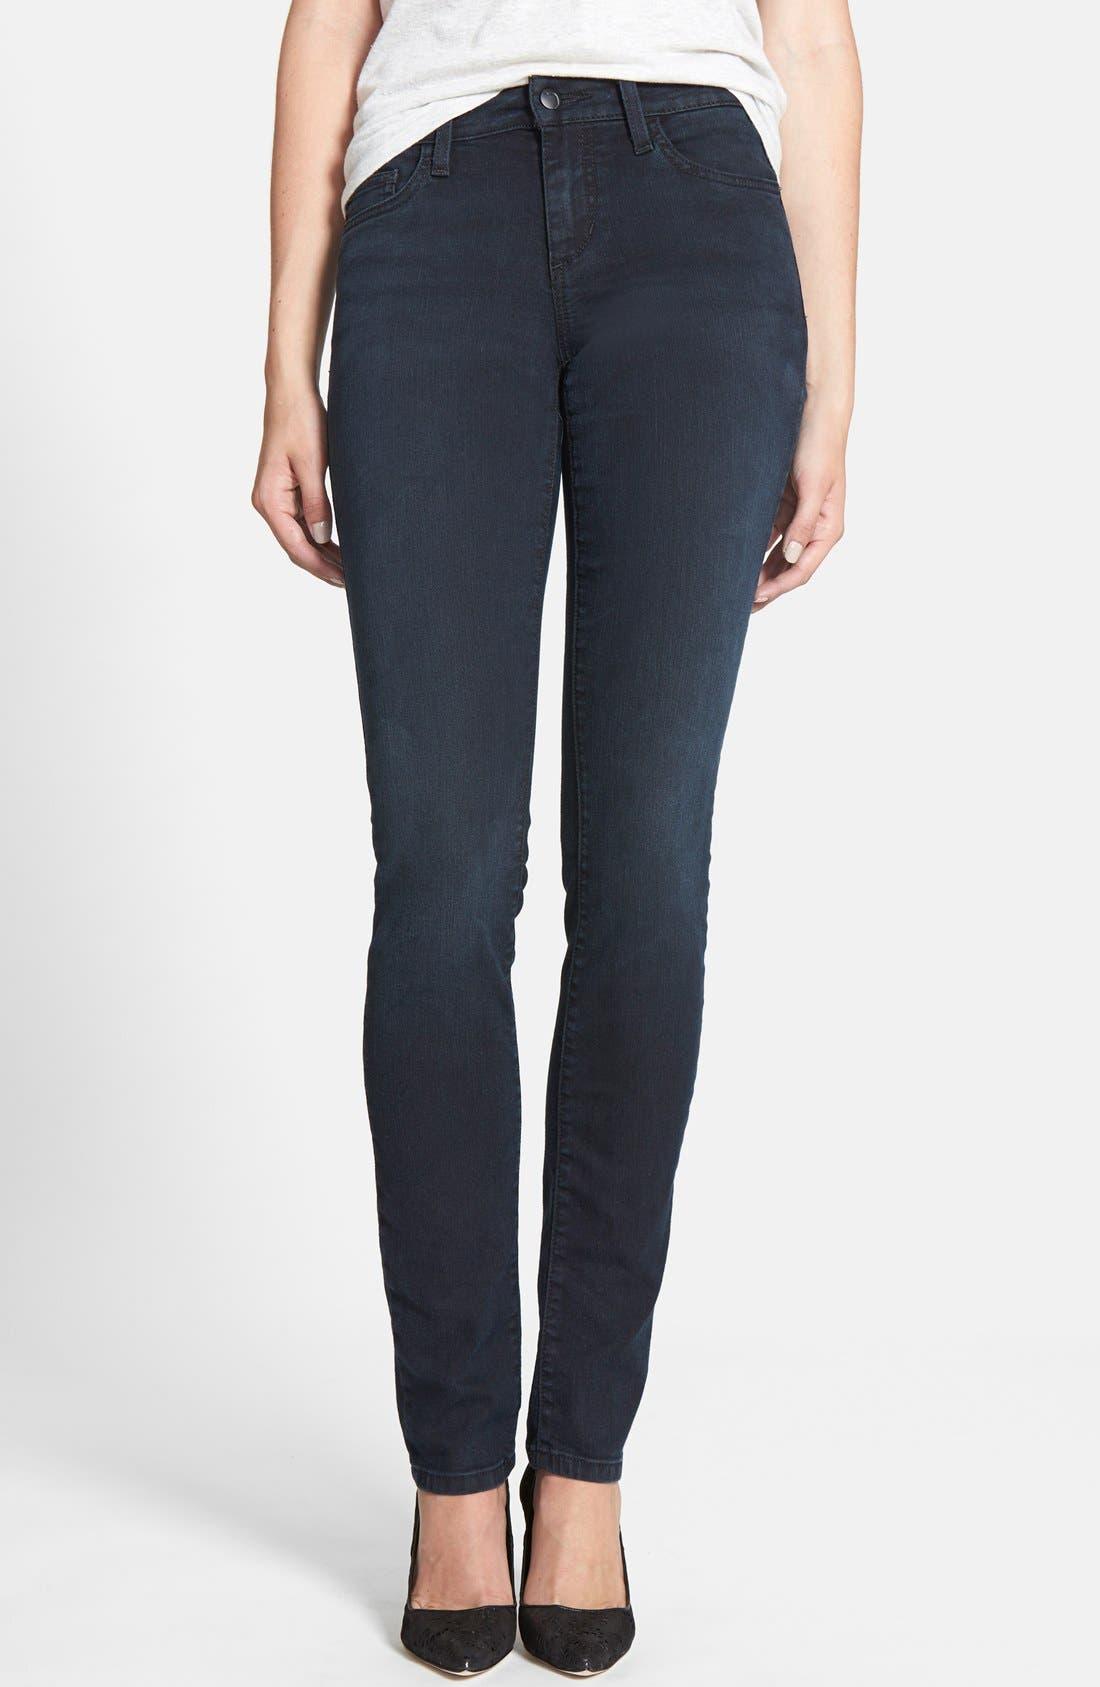 Alternate Image 1 Selected - Joe's Curvy Skinny Jeans (Ava)